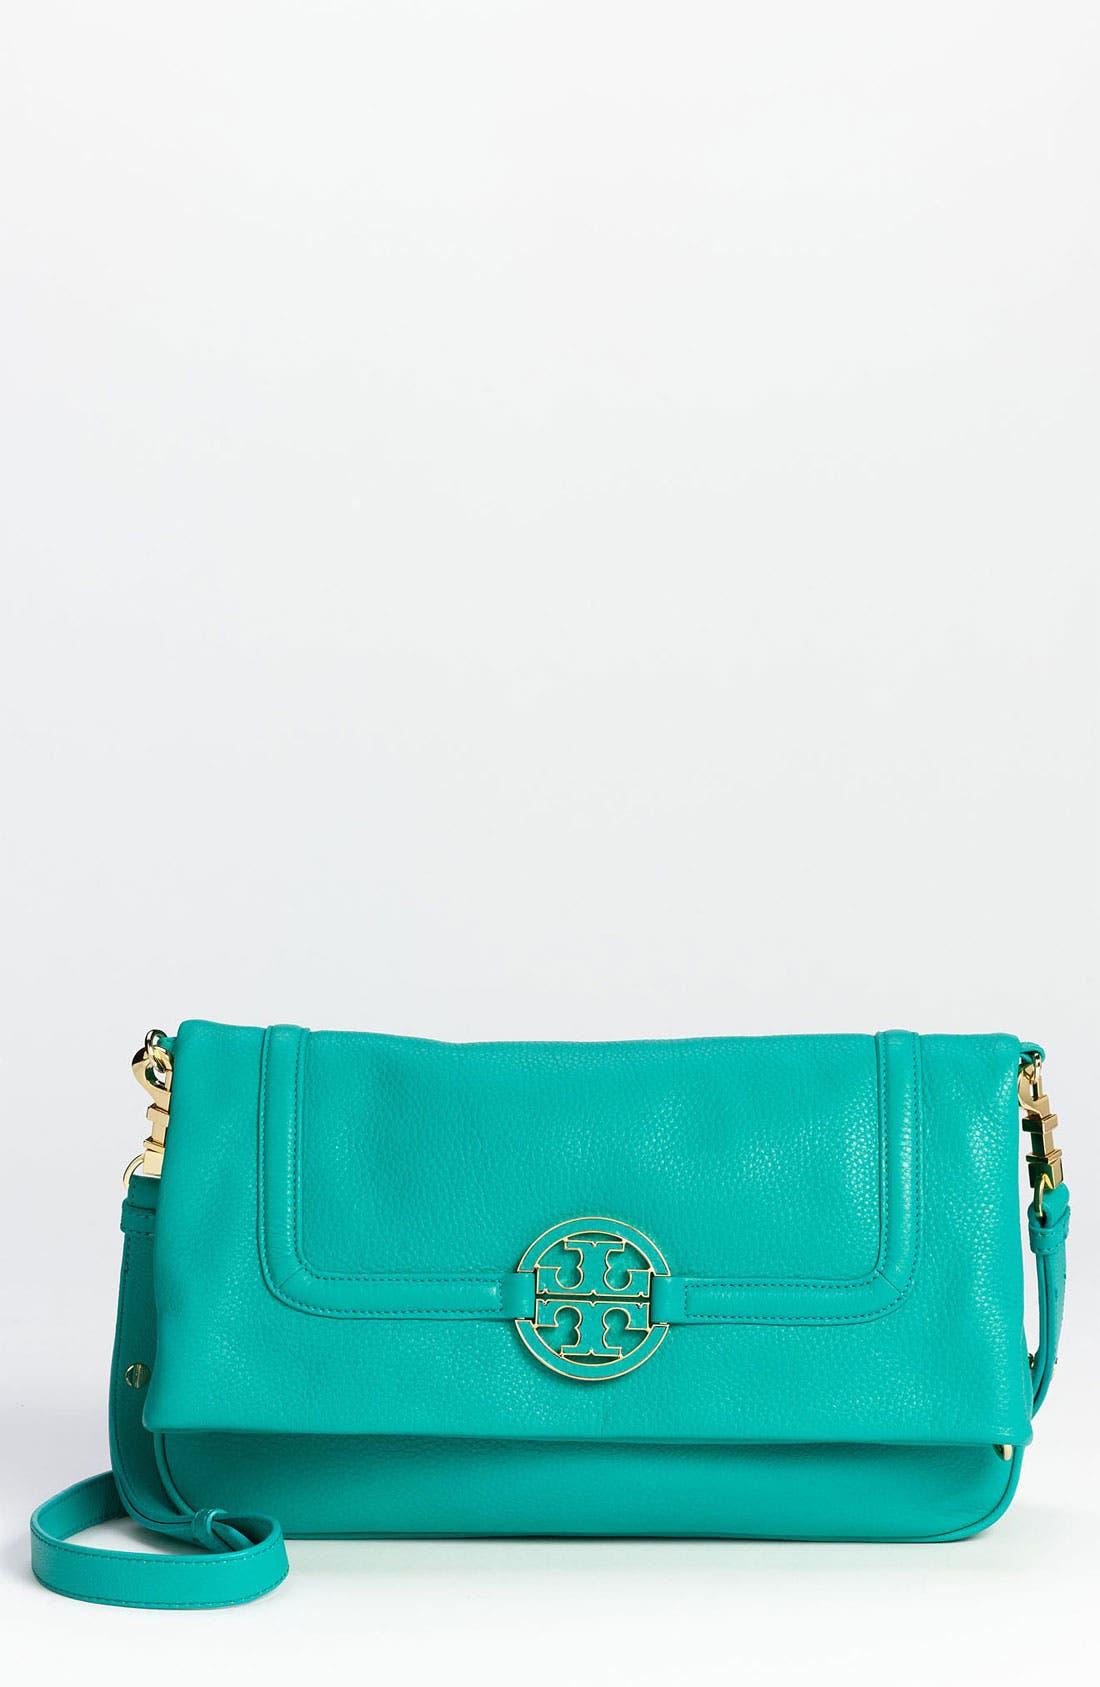 Alternate Image 1 Selected - Tory Burch 'Amanda' Foldover Crossbody Bag